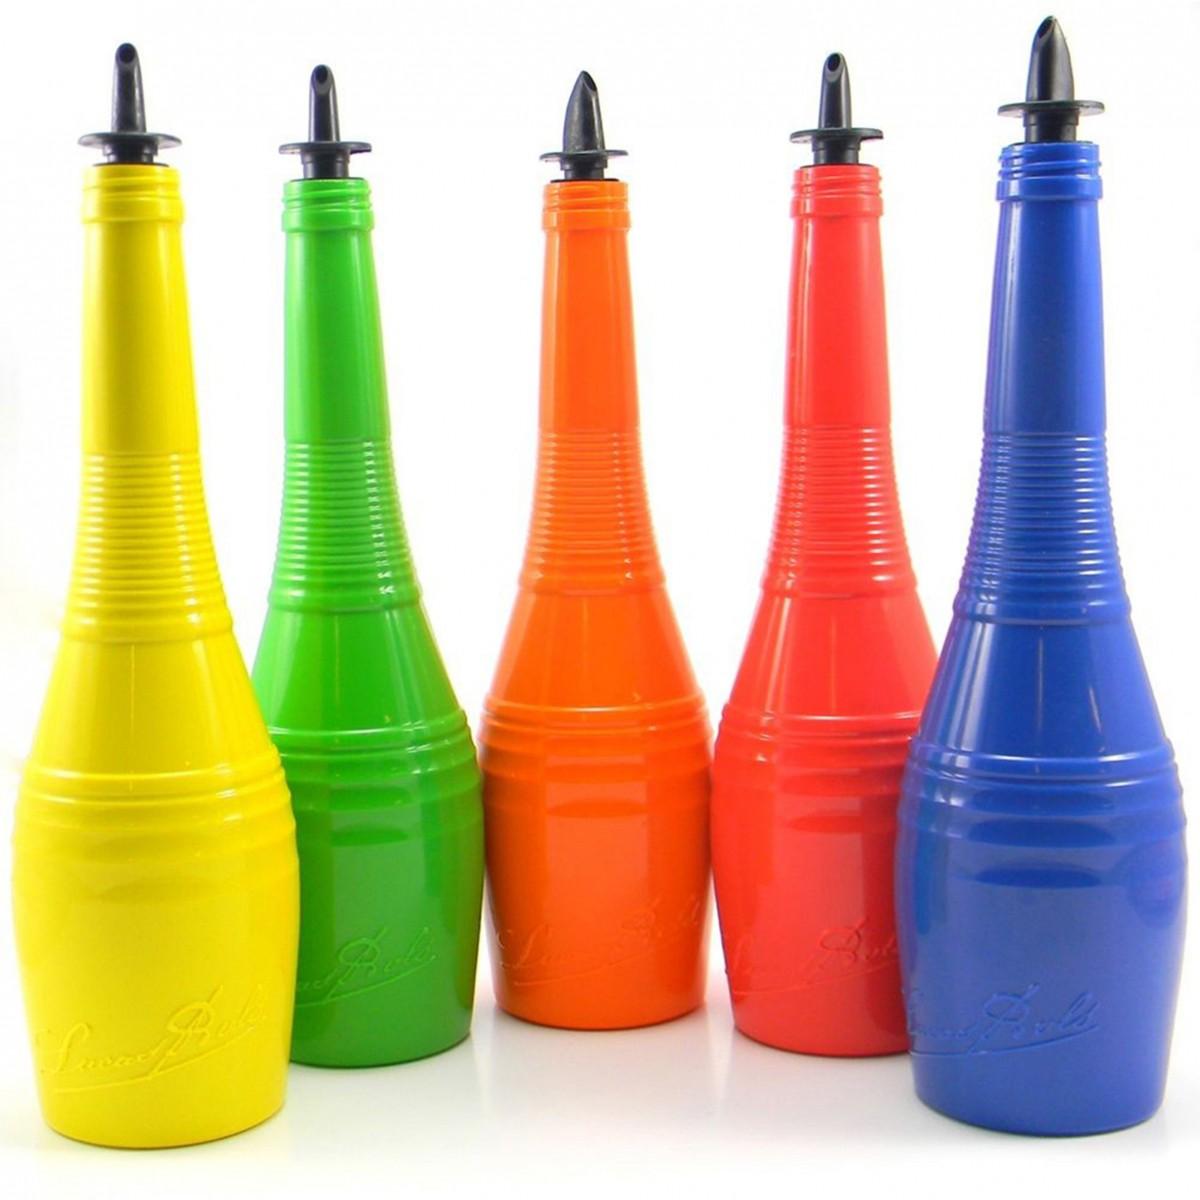 New Bols flair bottle Flairco 750ml.